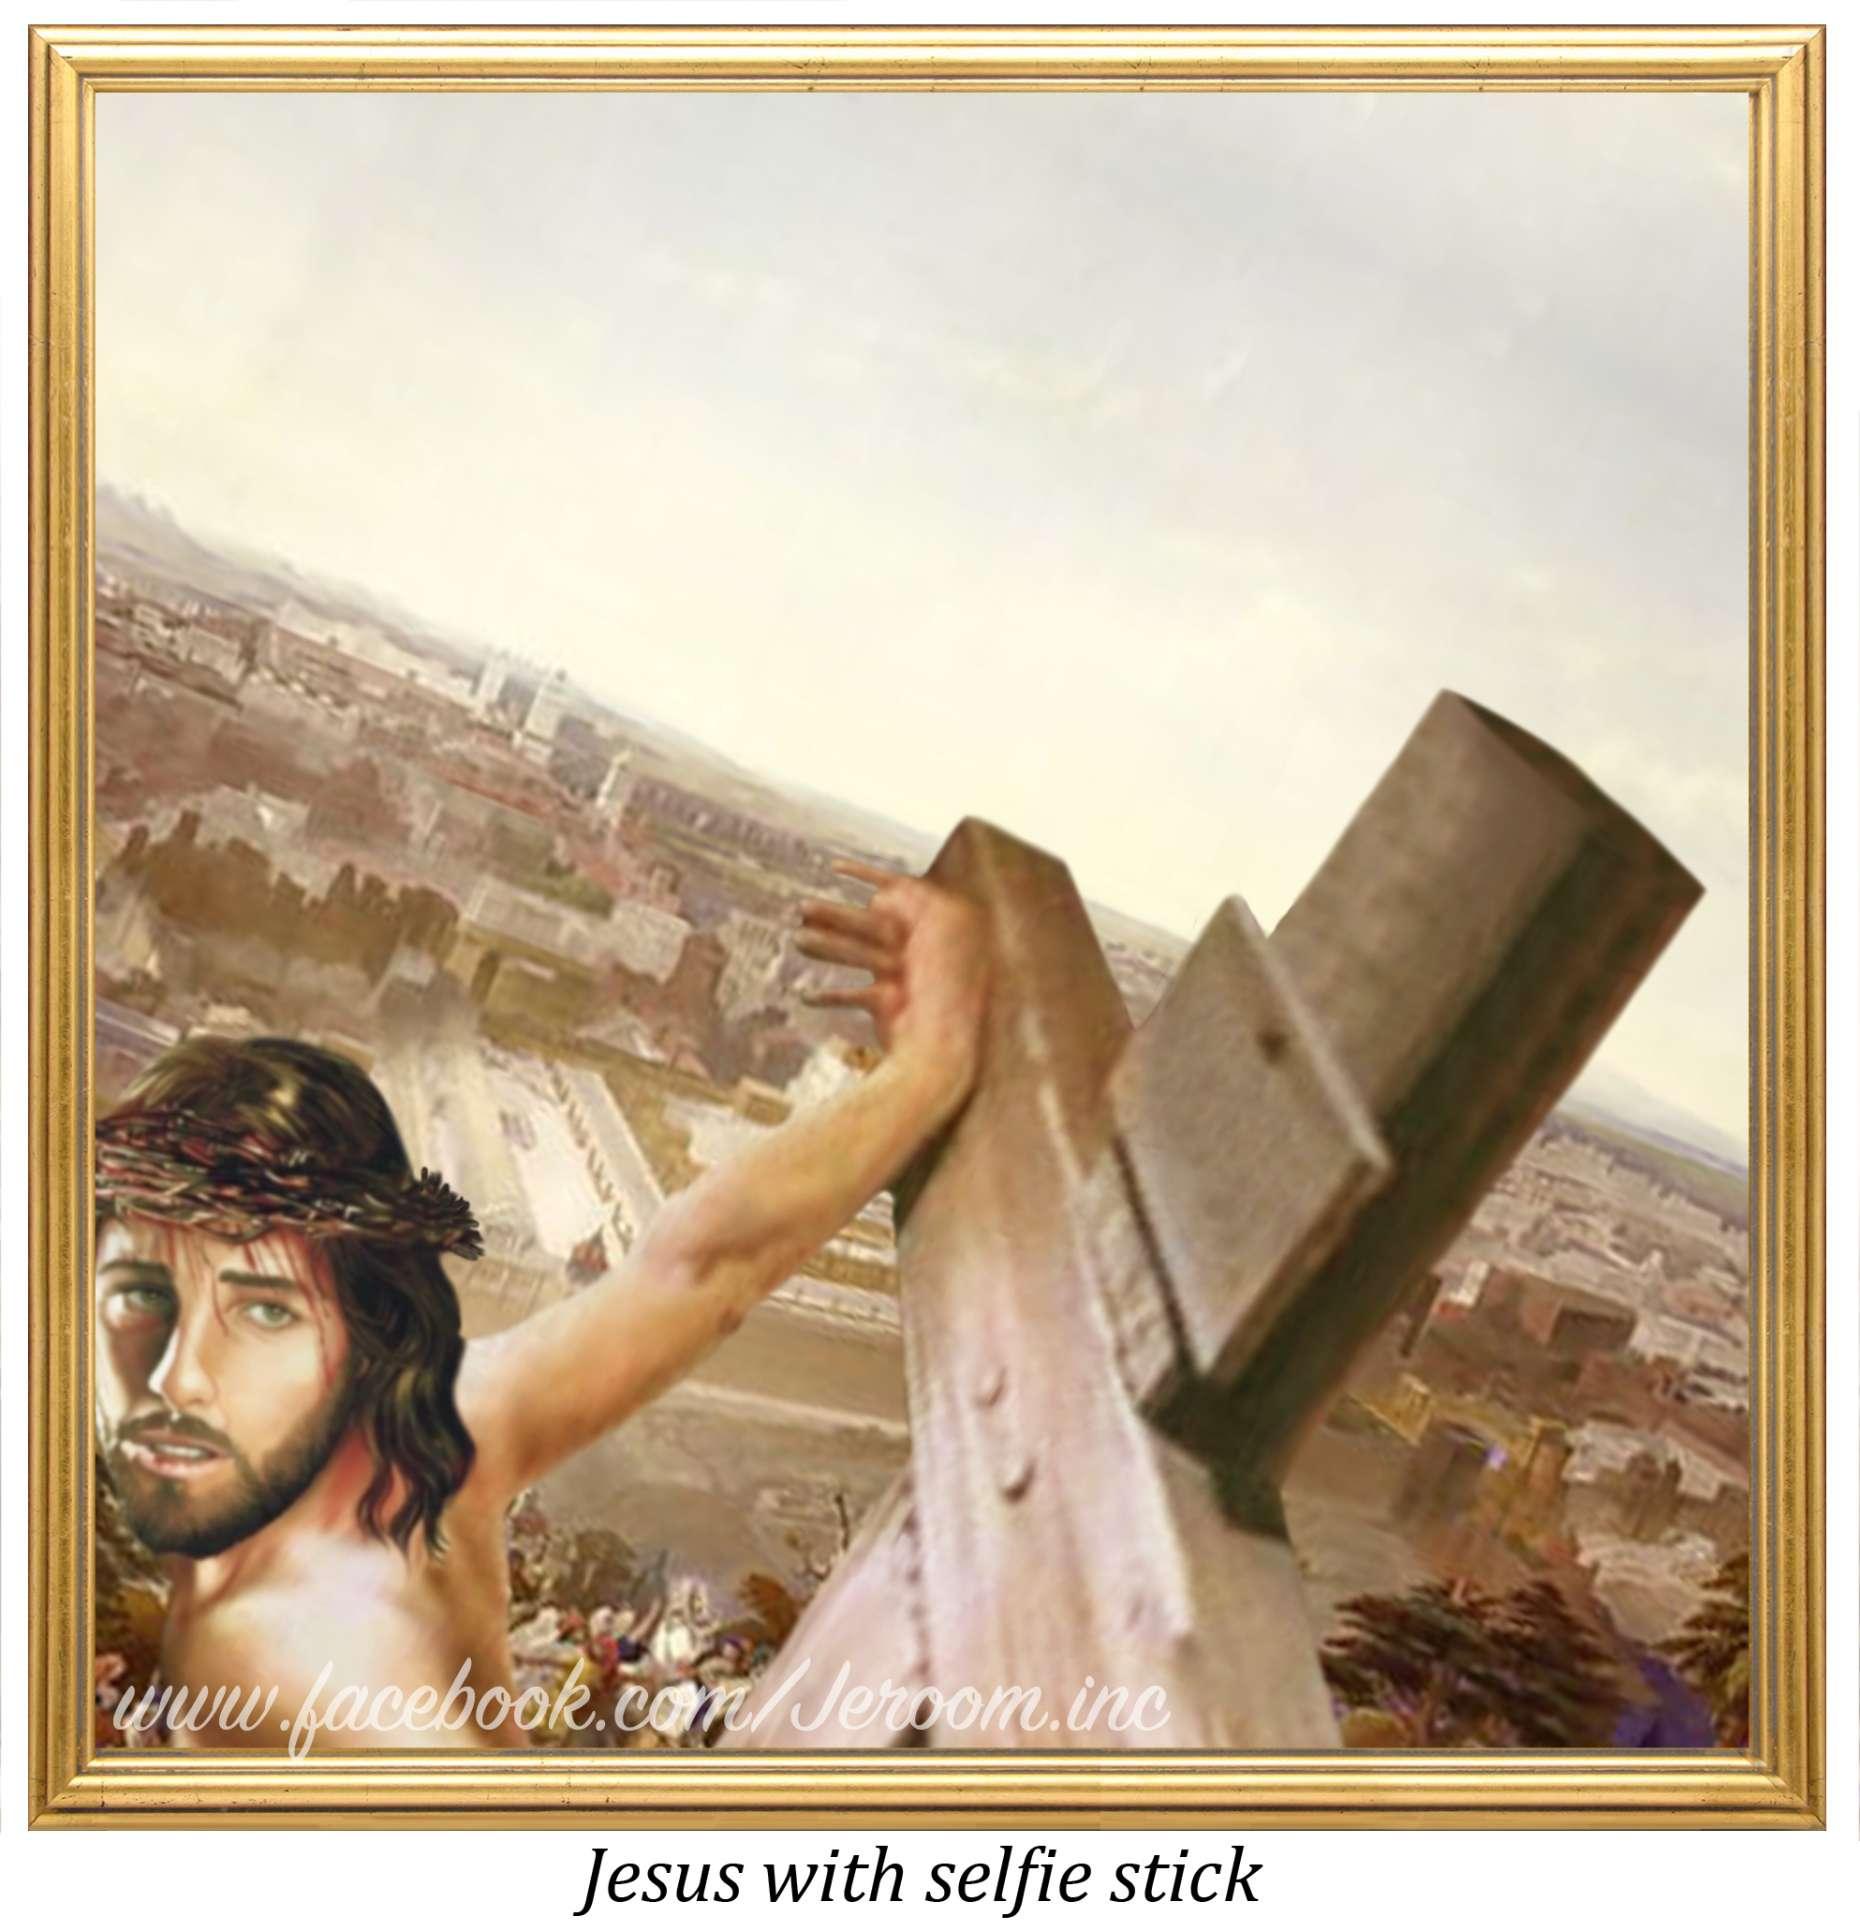 Jezus%20selfie.jpg?itok=7EwmkG-7